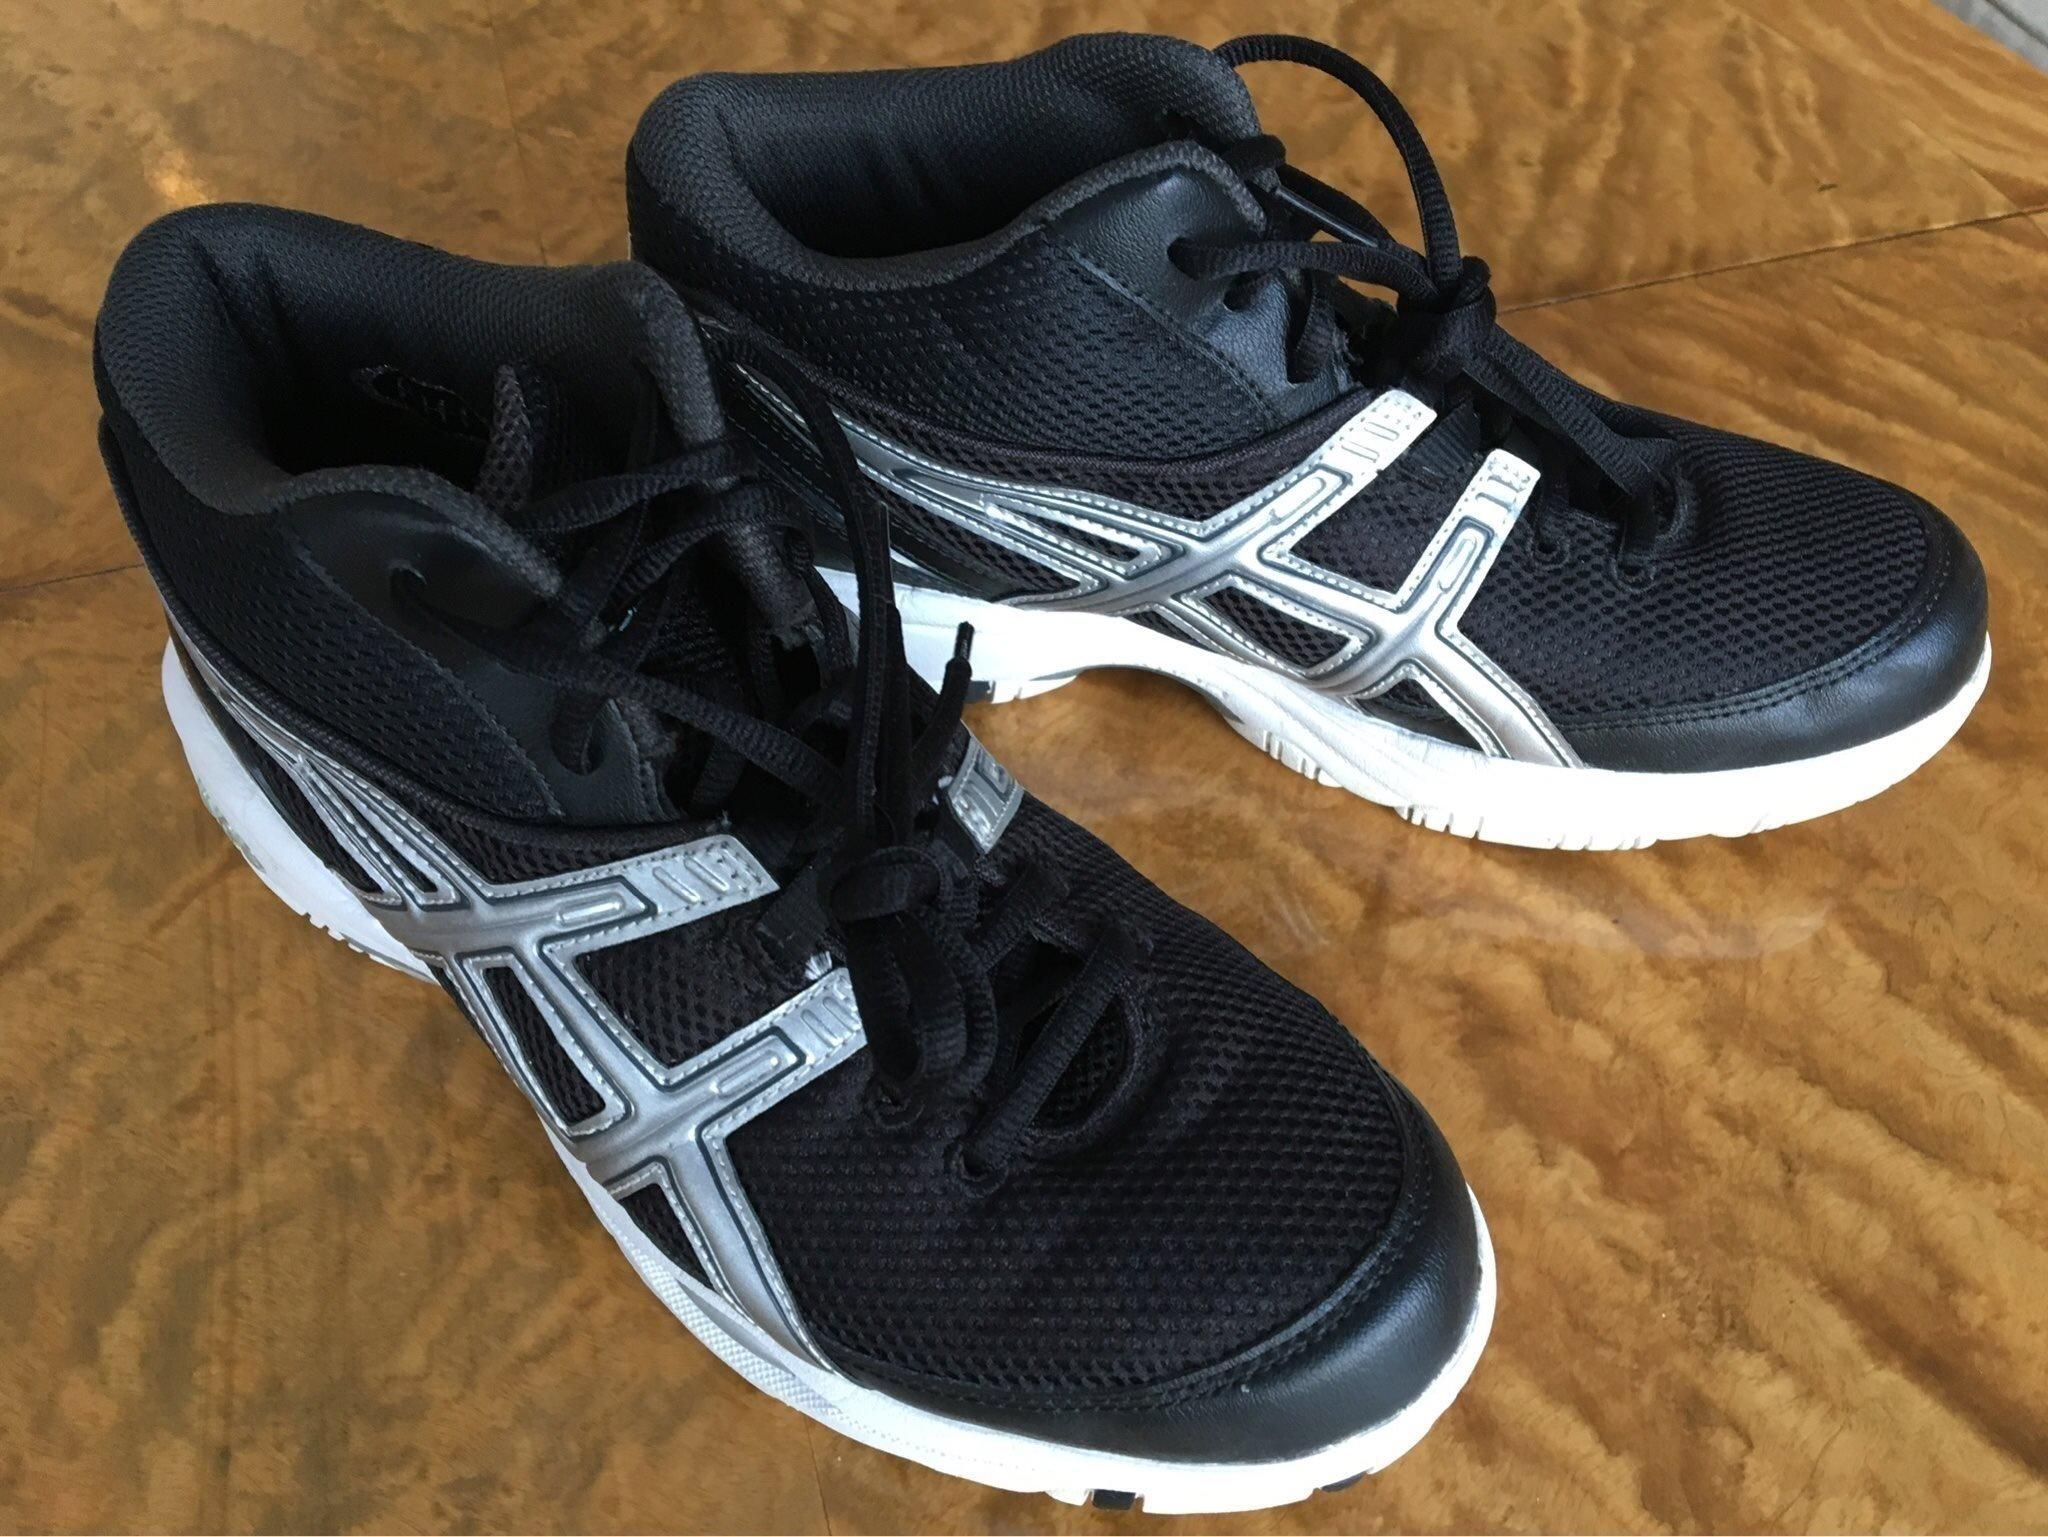 söt snygg 2018 sneakers asics aeroshape ddesigns.se